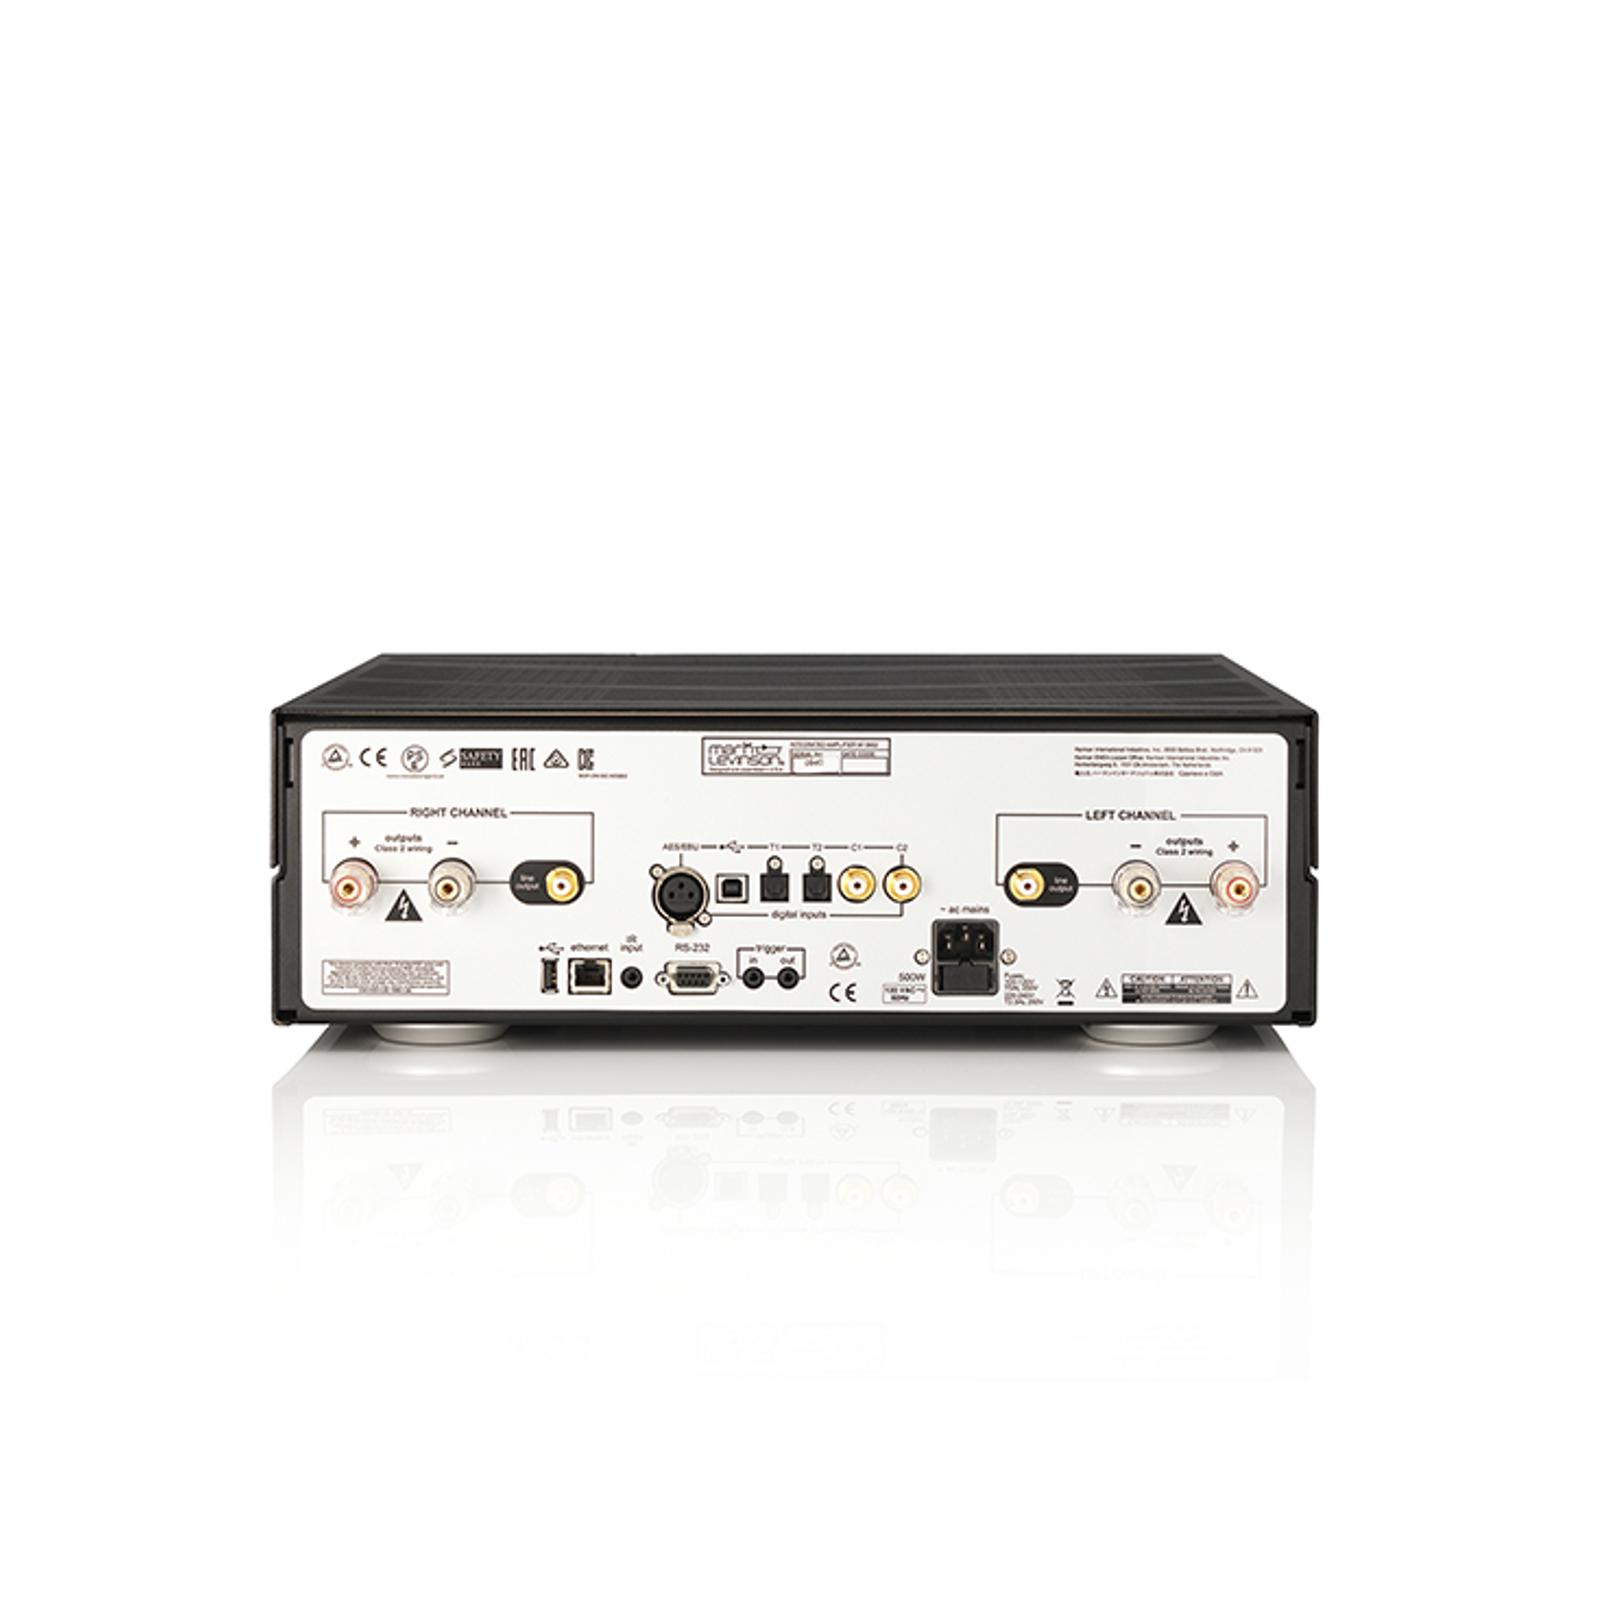 № 5802 - Black / Silver - Integrated Amplifier for Digital sources - Back